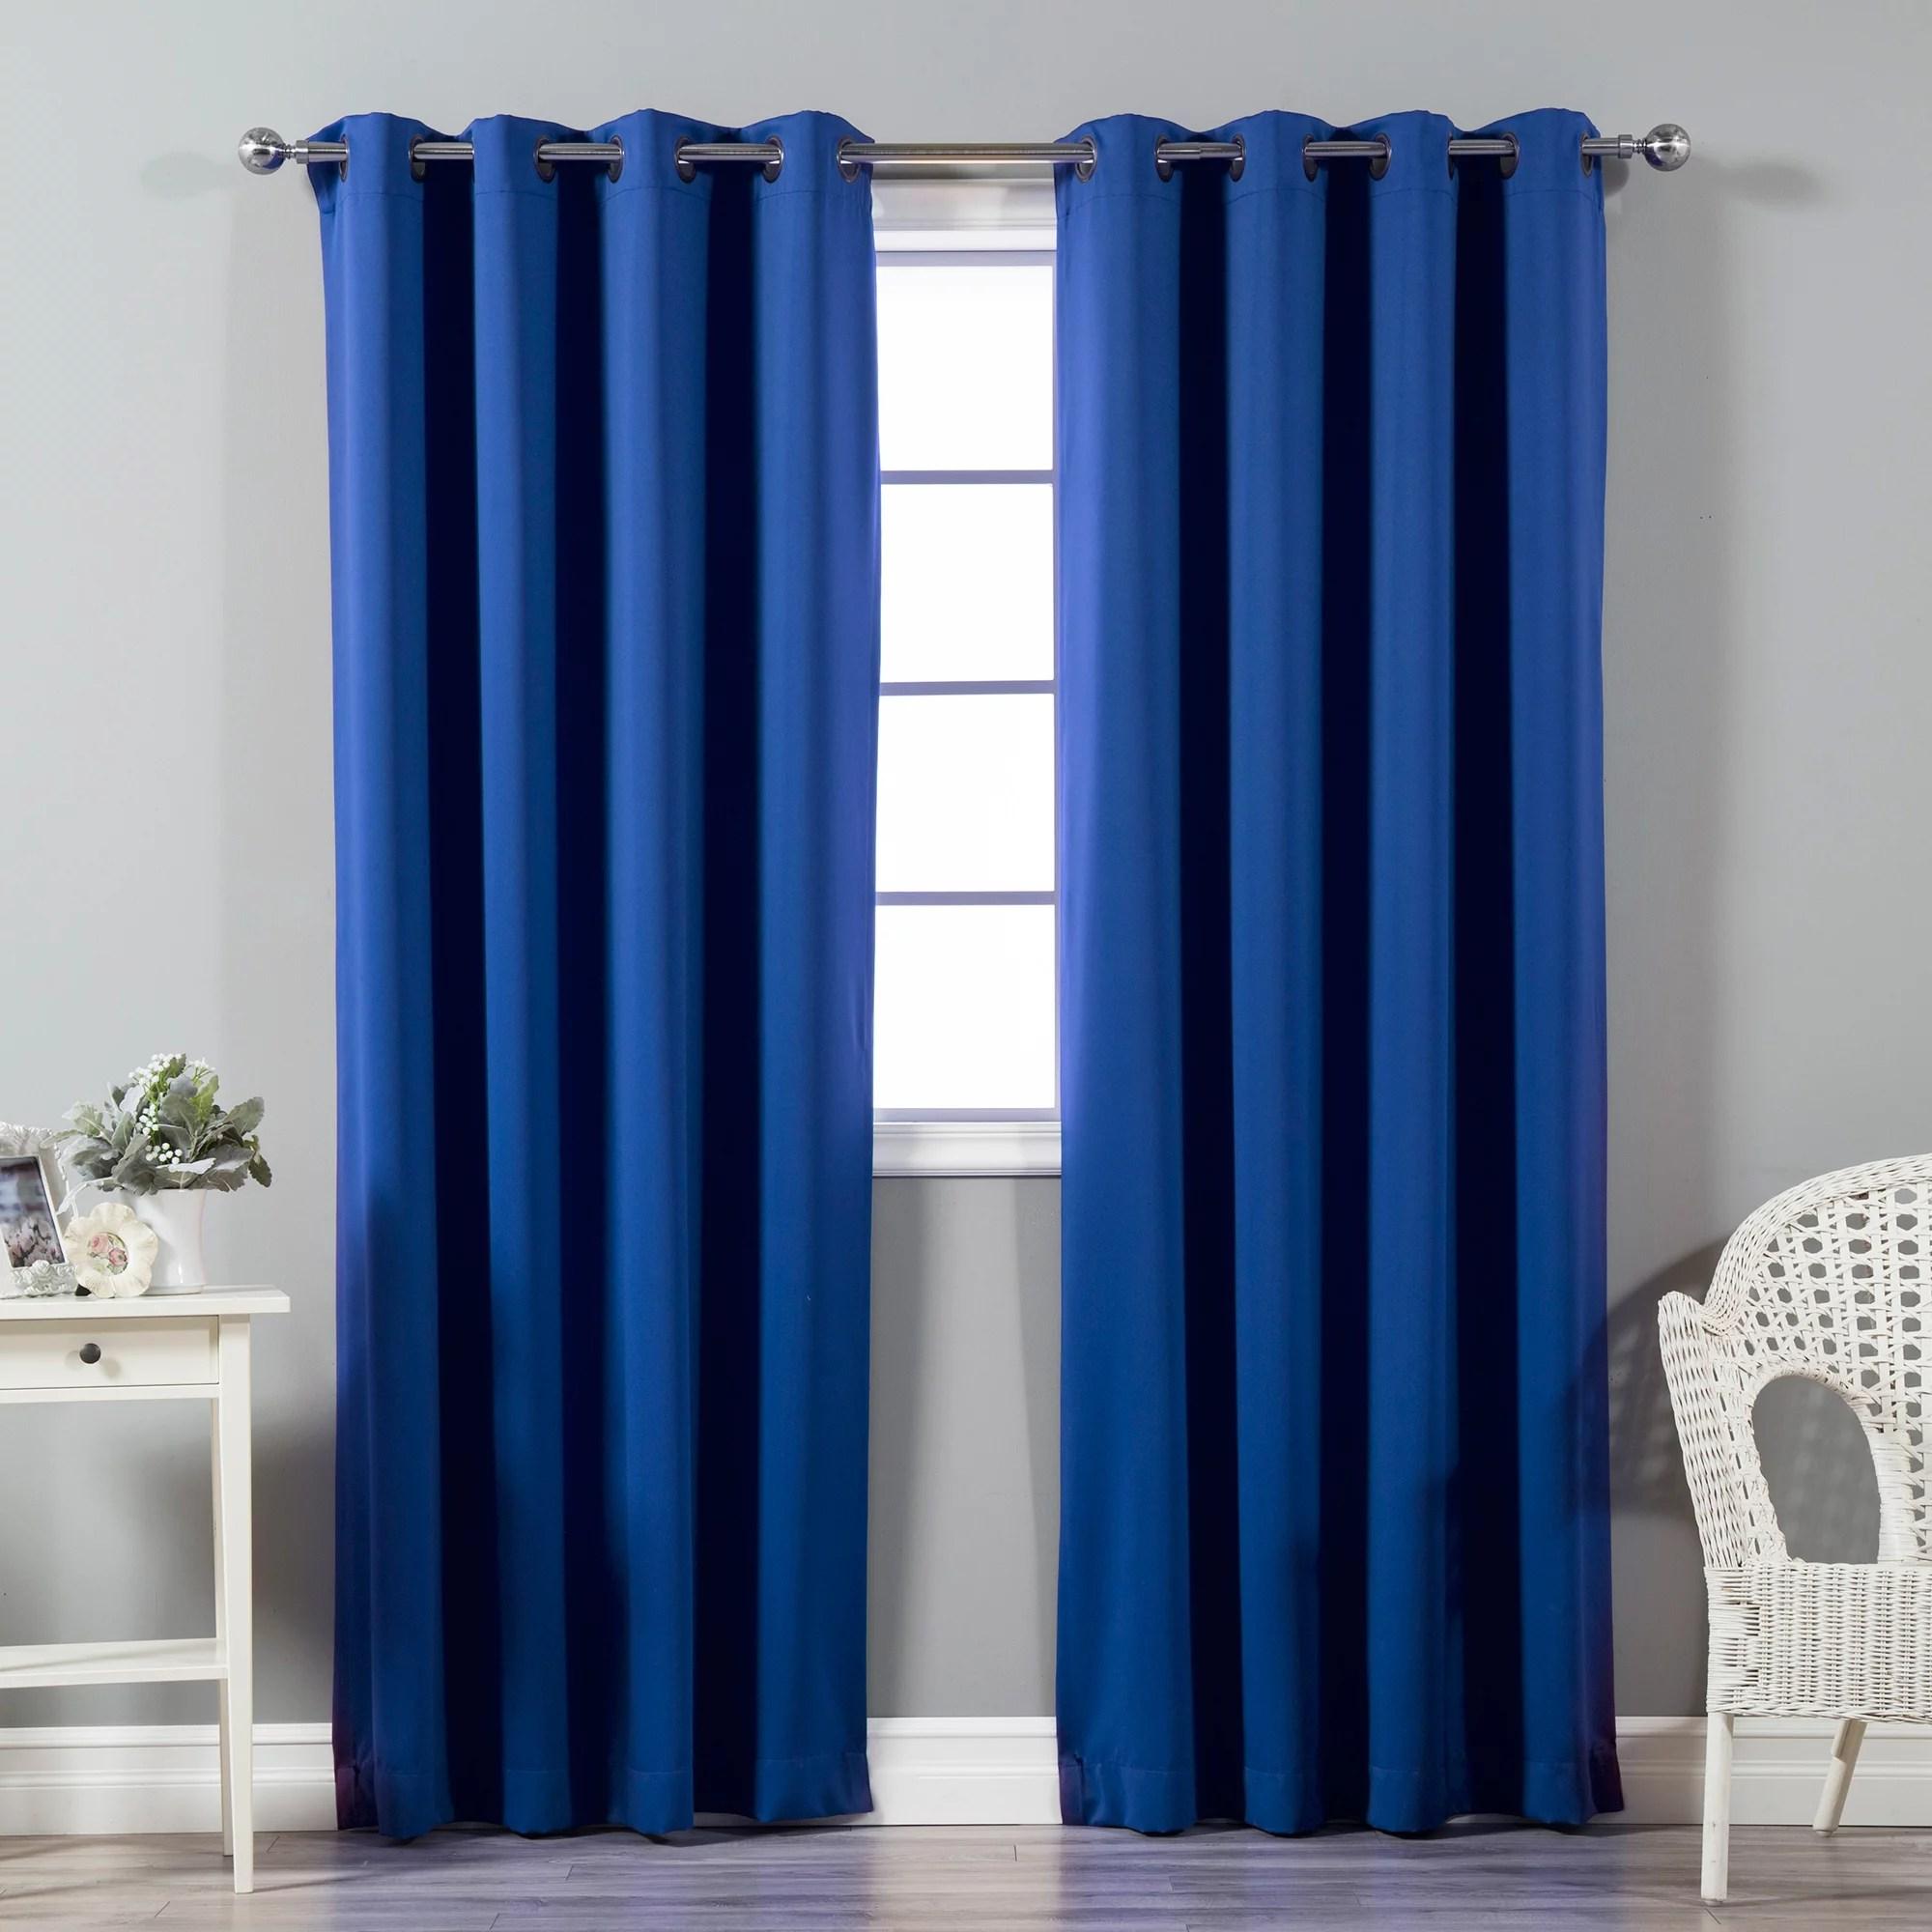 quality home basic thermal blackout curtains antique bronze grommet top royal blue set of 2 panels